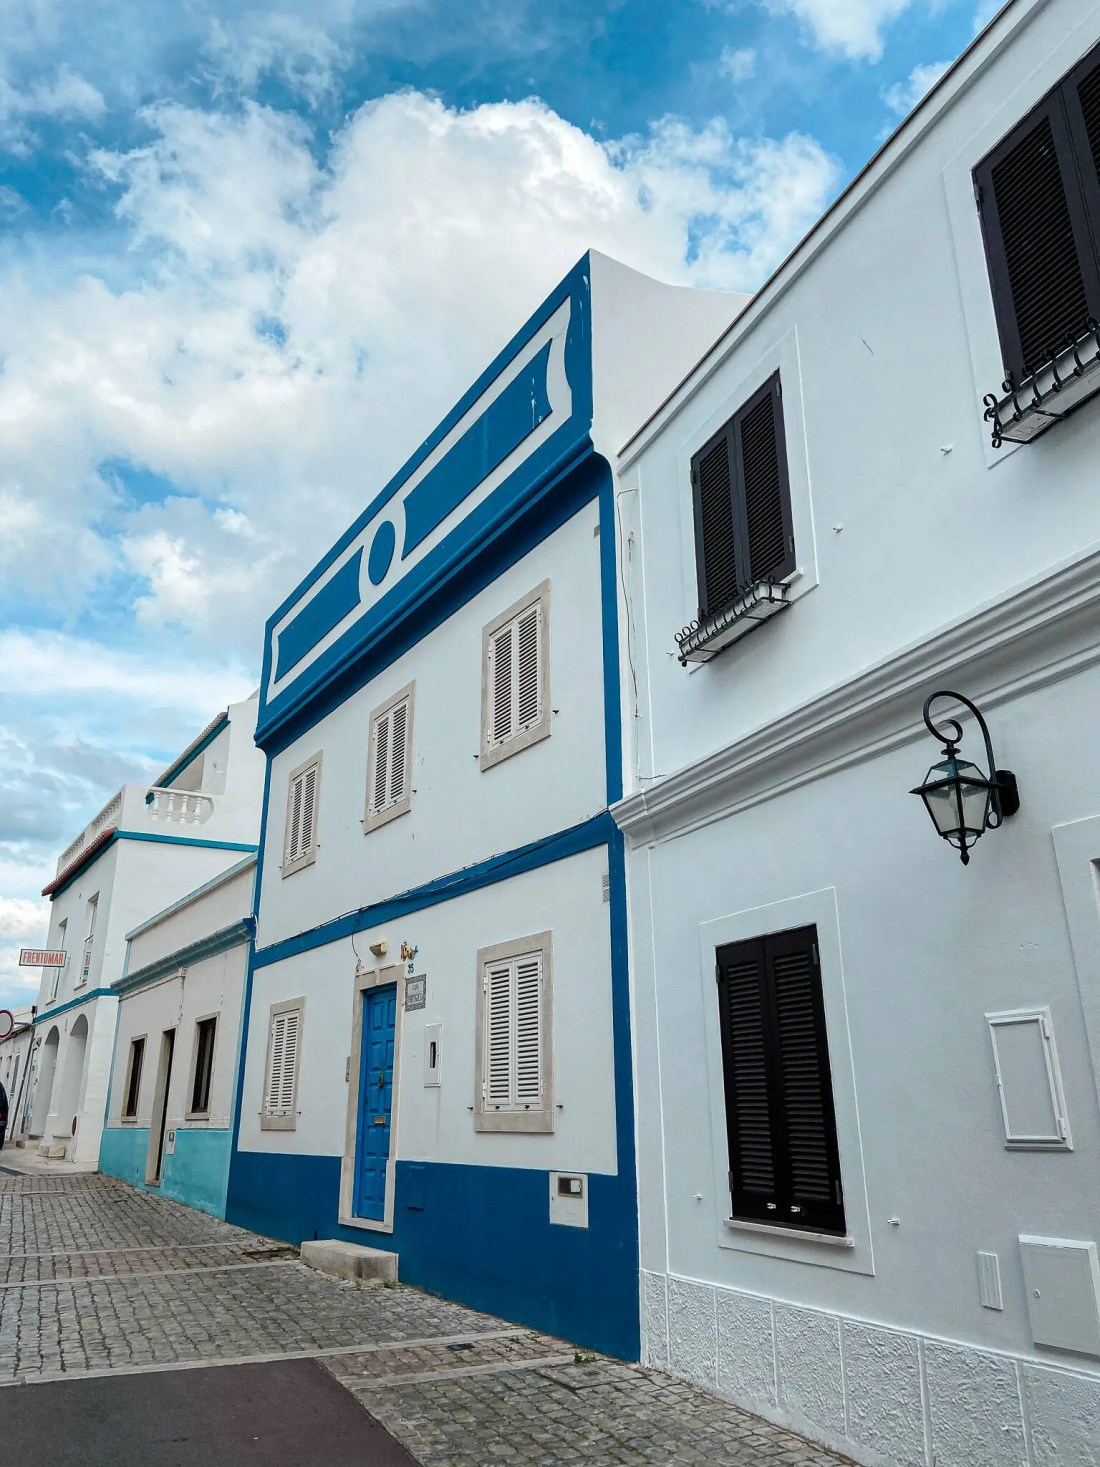 Best Boutique Hotels in Albuferia